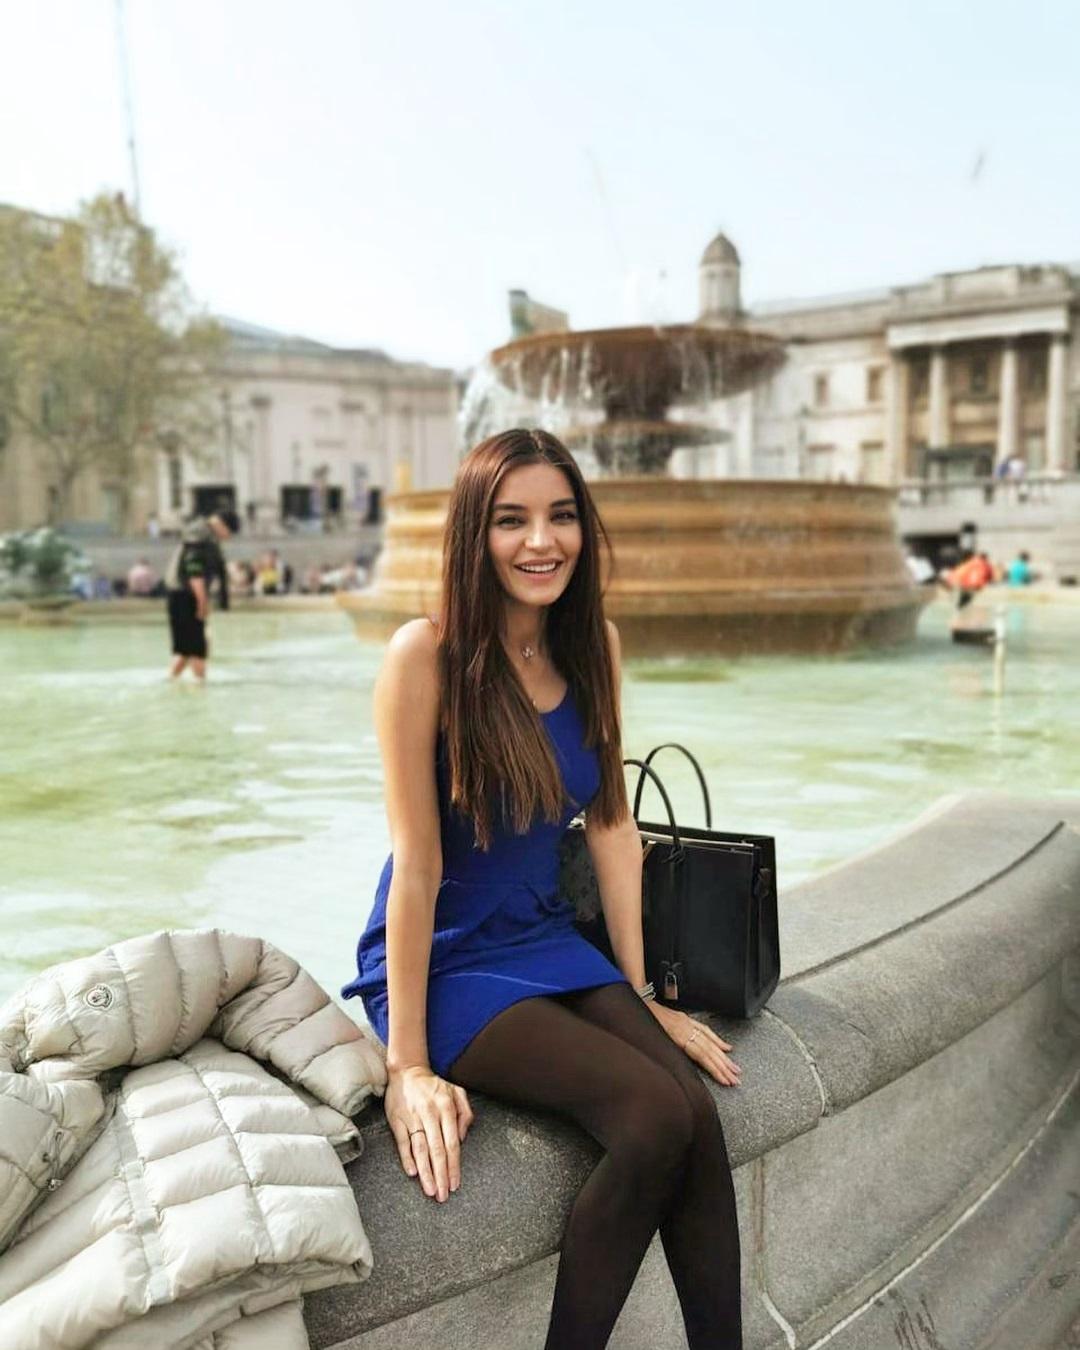 Awesome Photos of Actress Sadia Khan in London